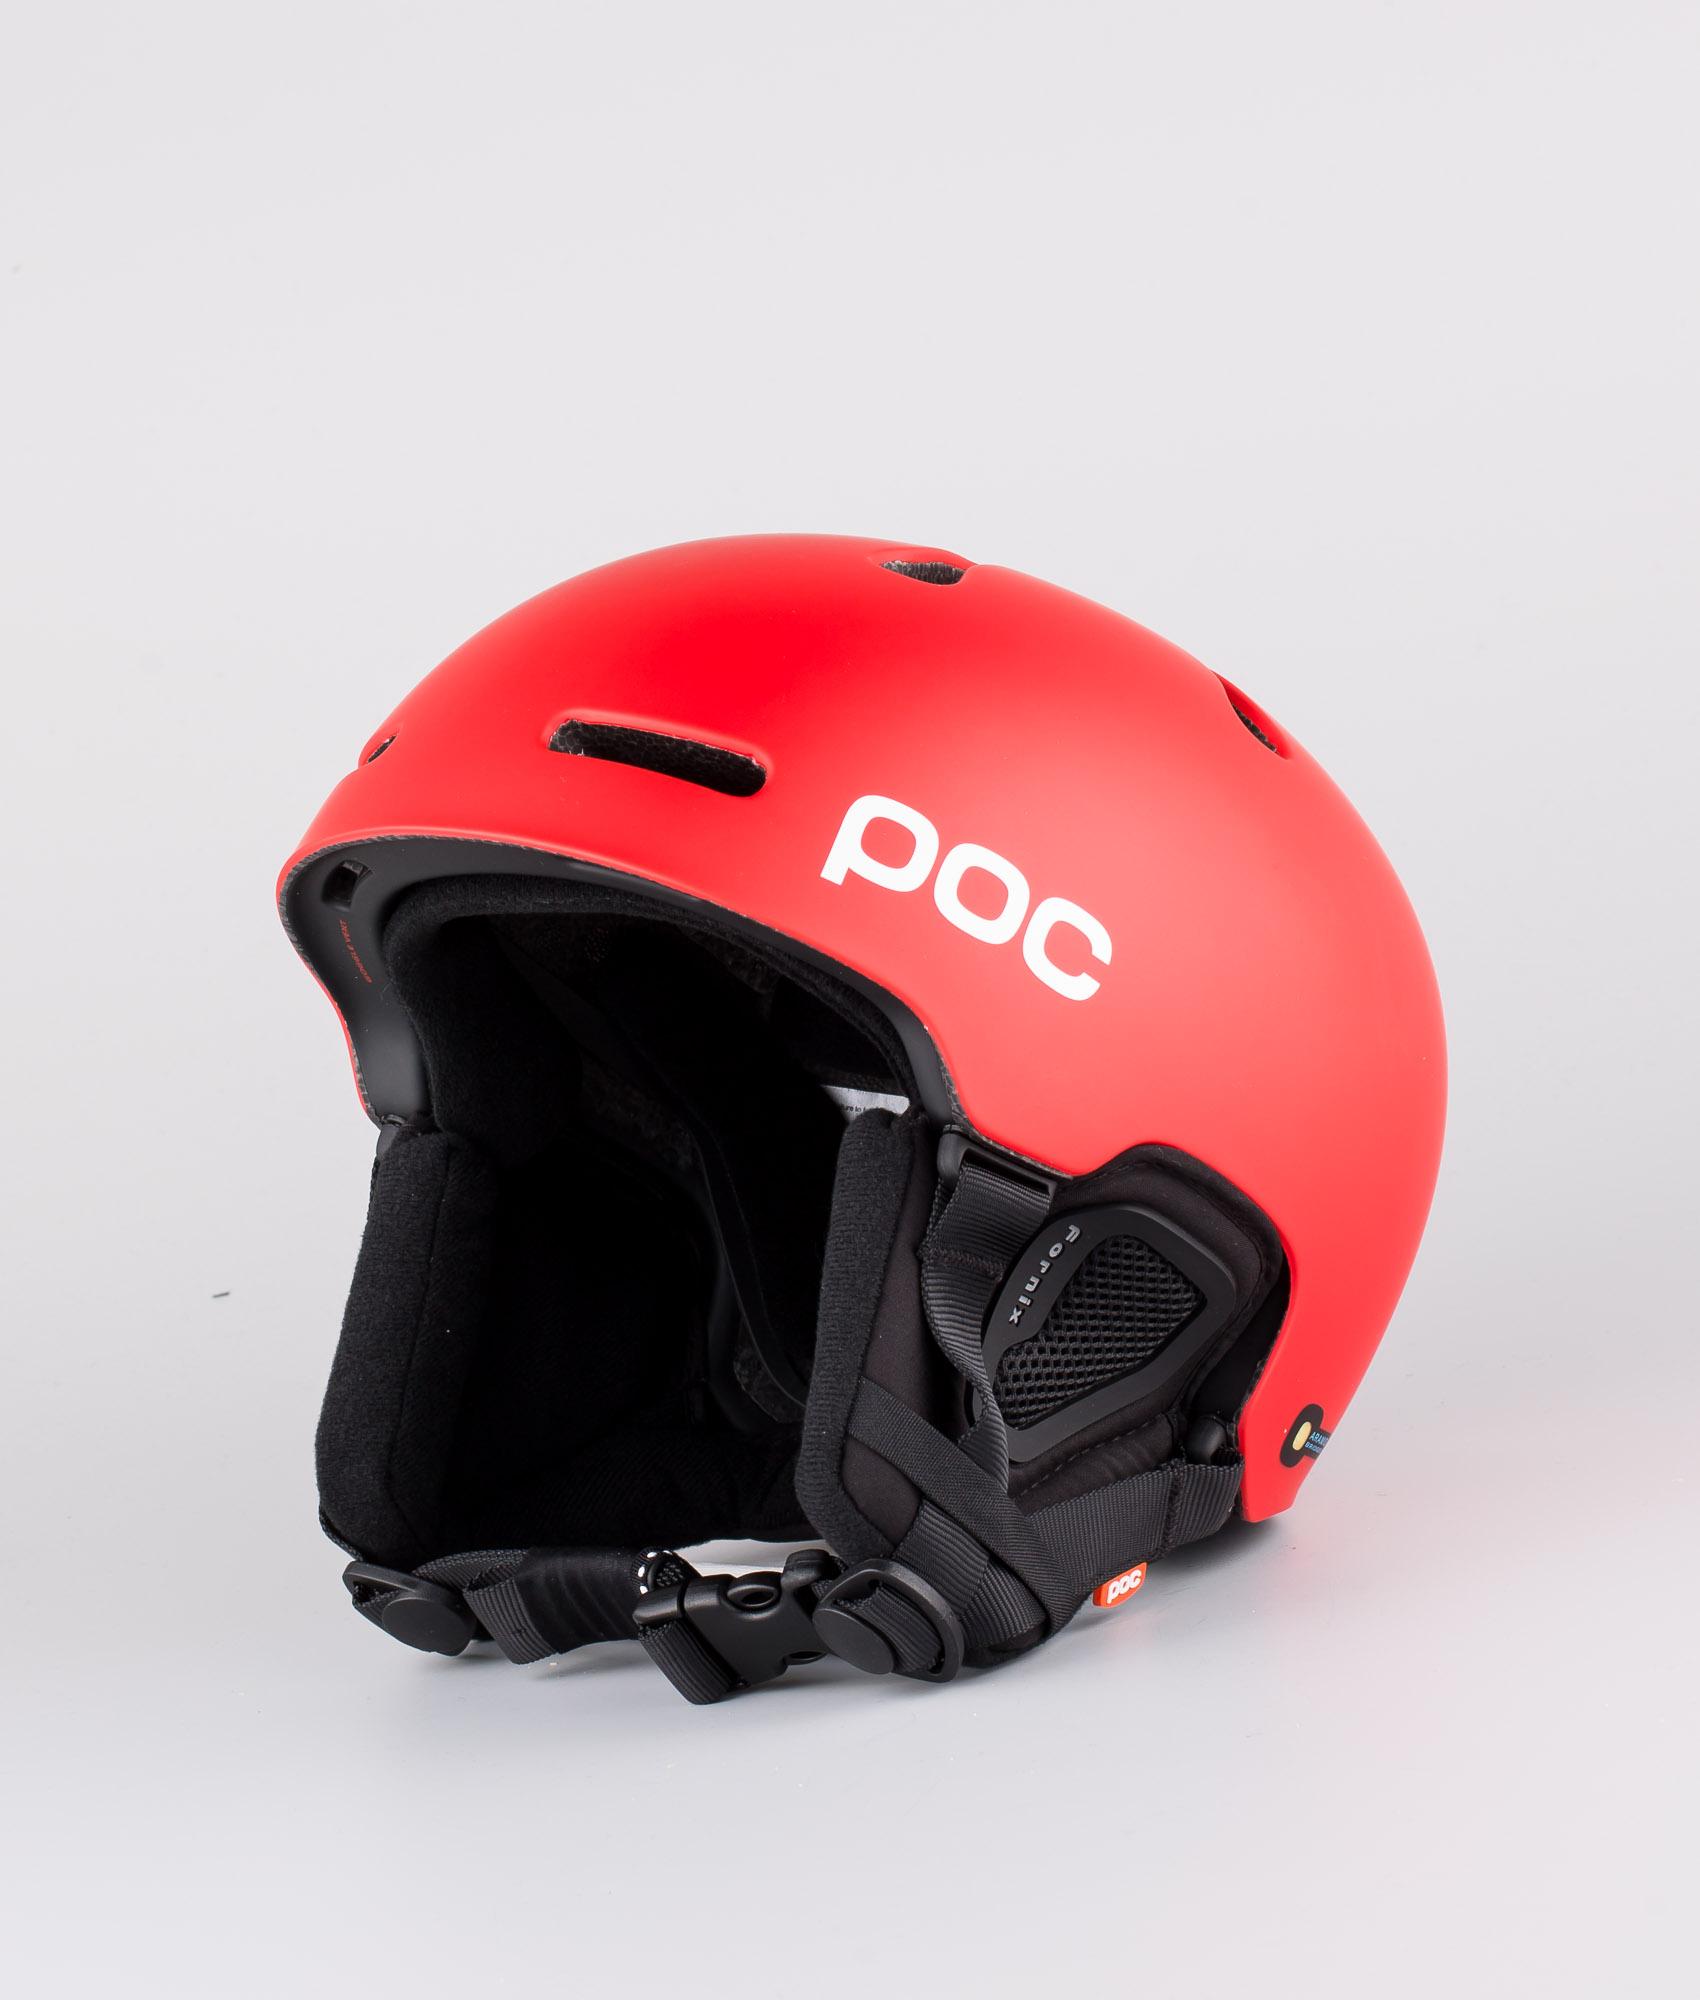 Poc Fornix Ski Helmet Prismane Red Ridestore Com